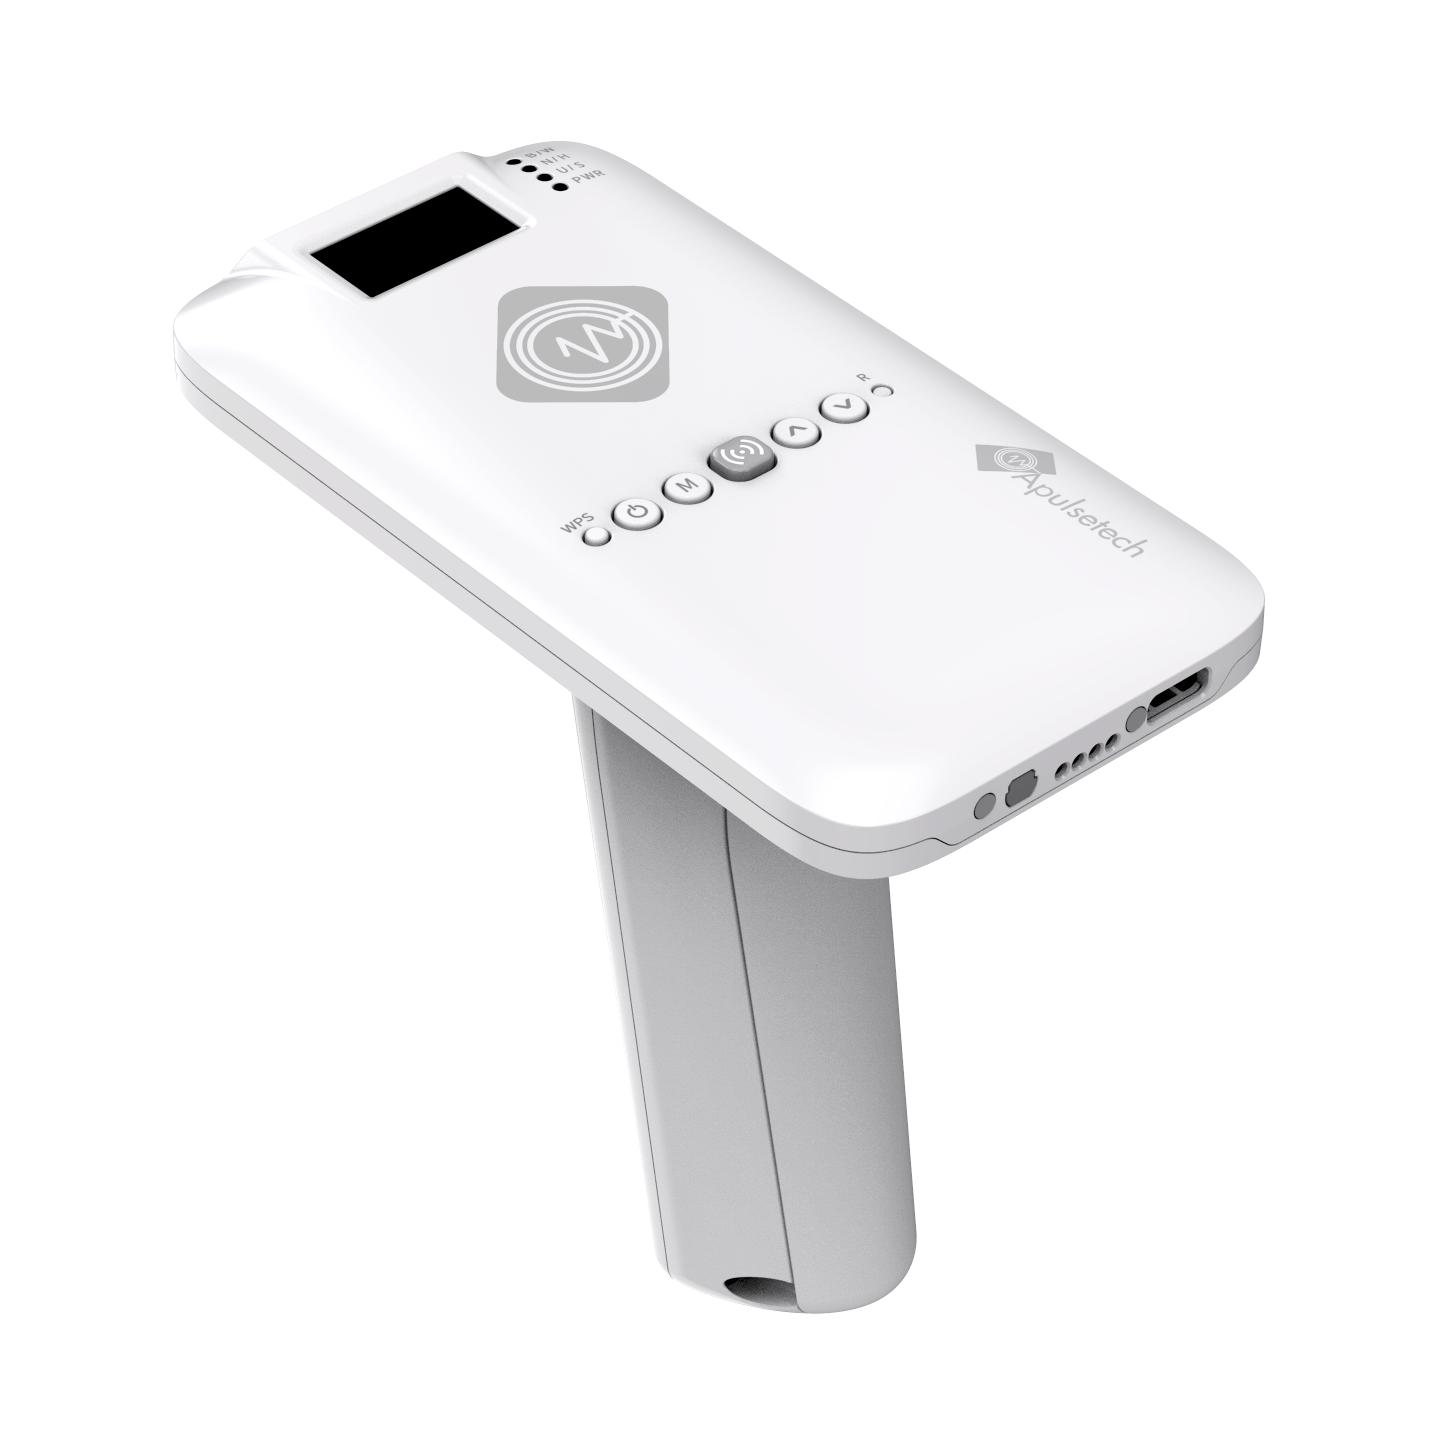 a611- Handy RFID Reader